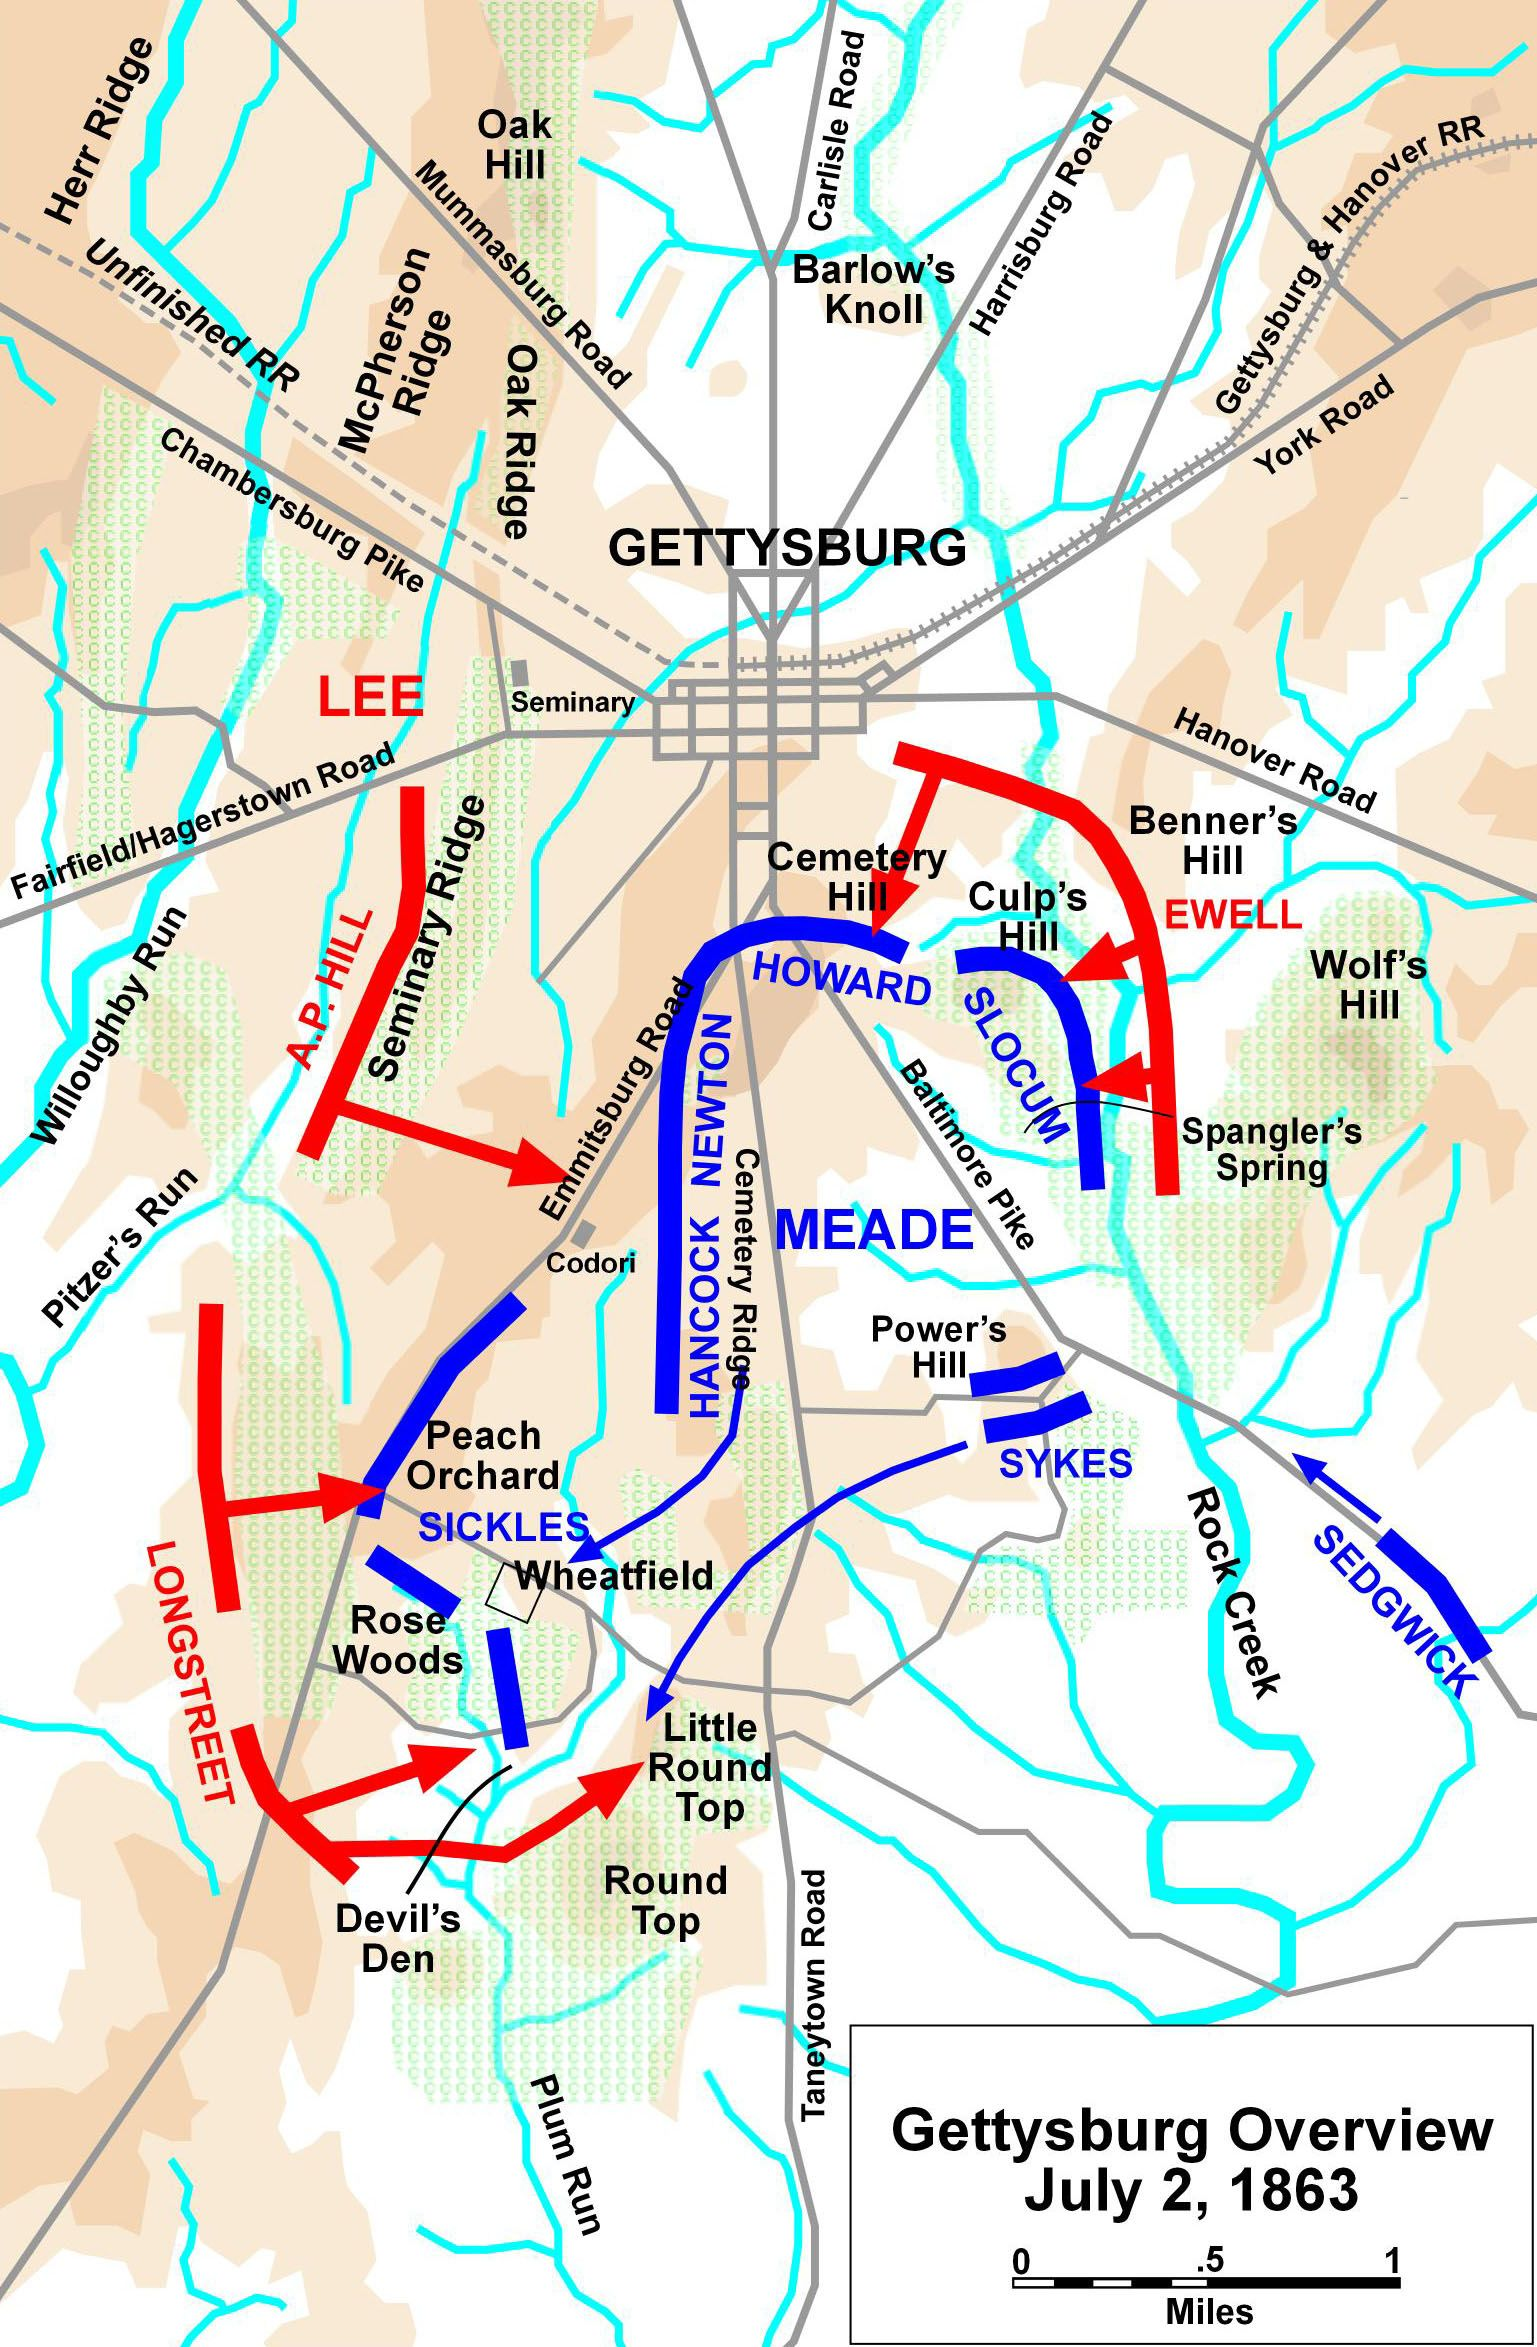 Battle Of Gettysburg July Gettysburg The Iron - Battle of gettysburg map us